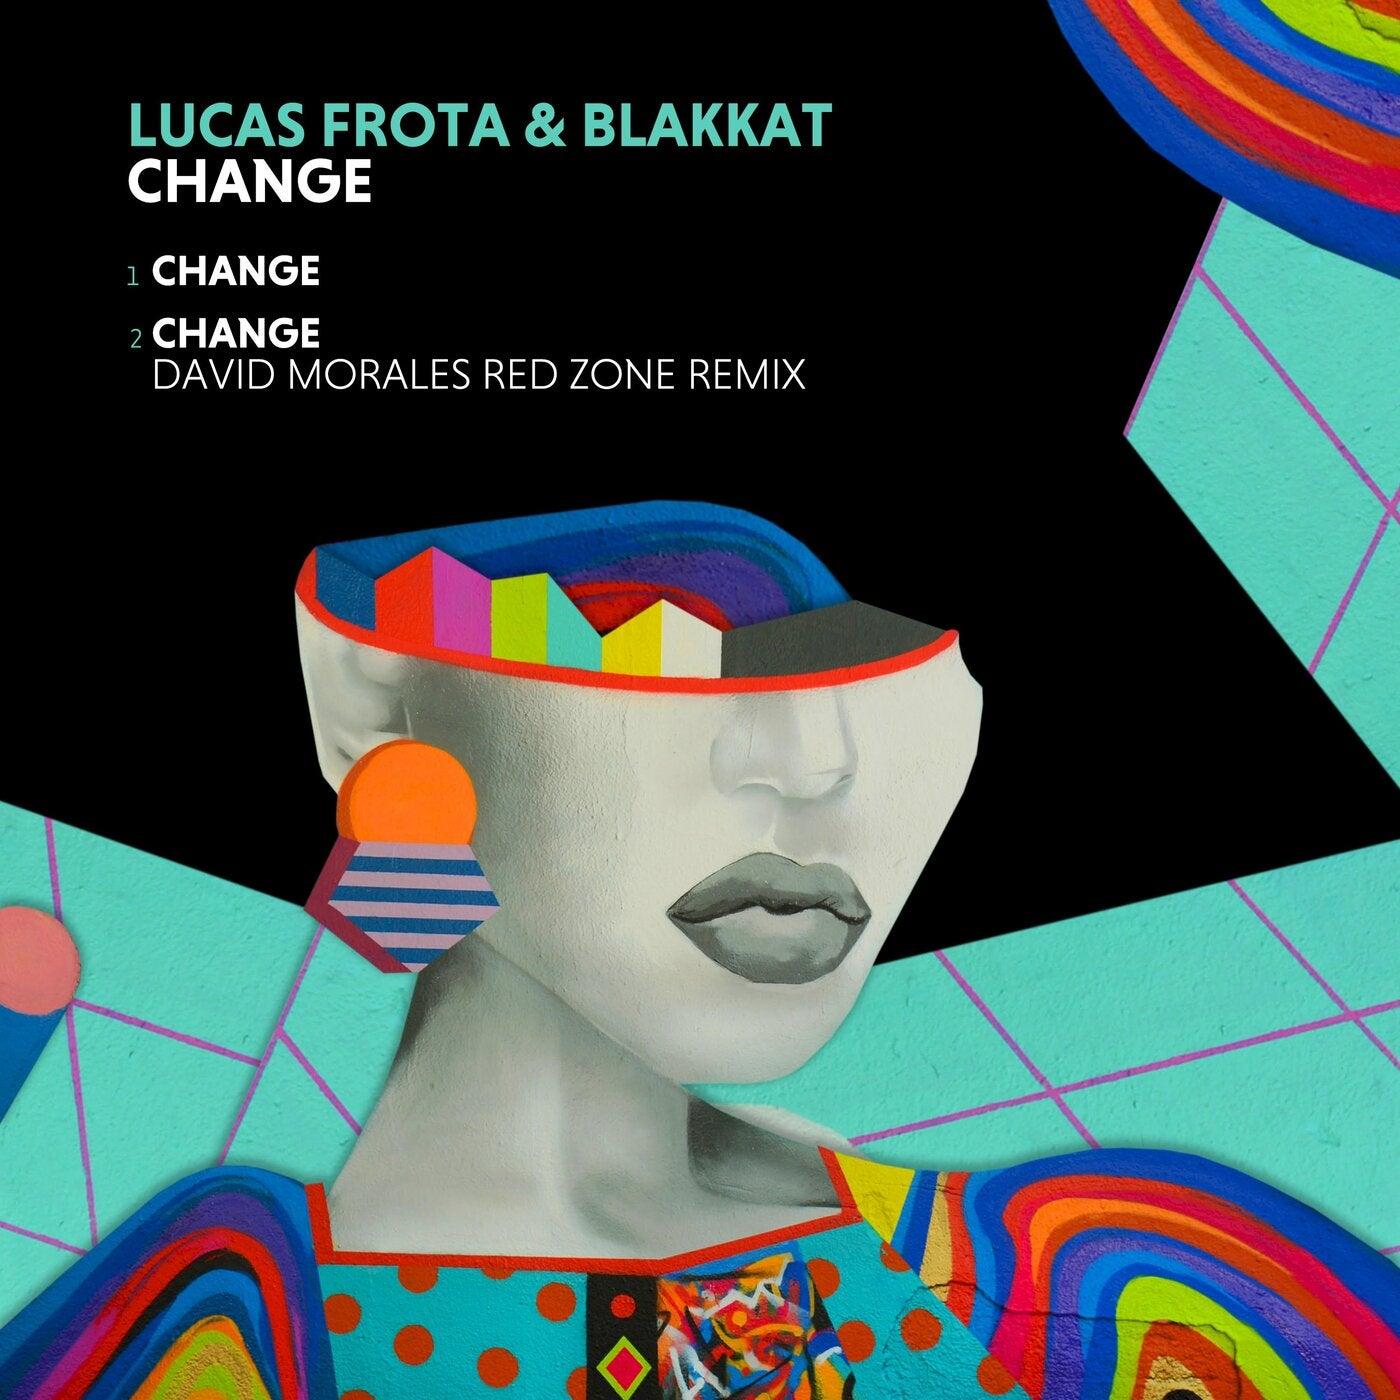 Change (David Morales Red Zone Remix)